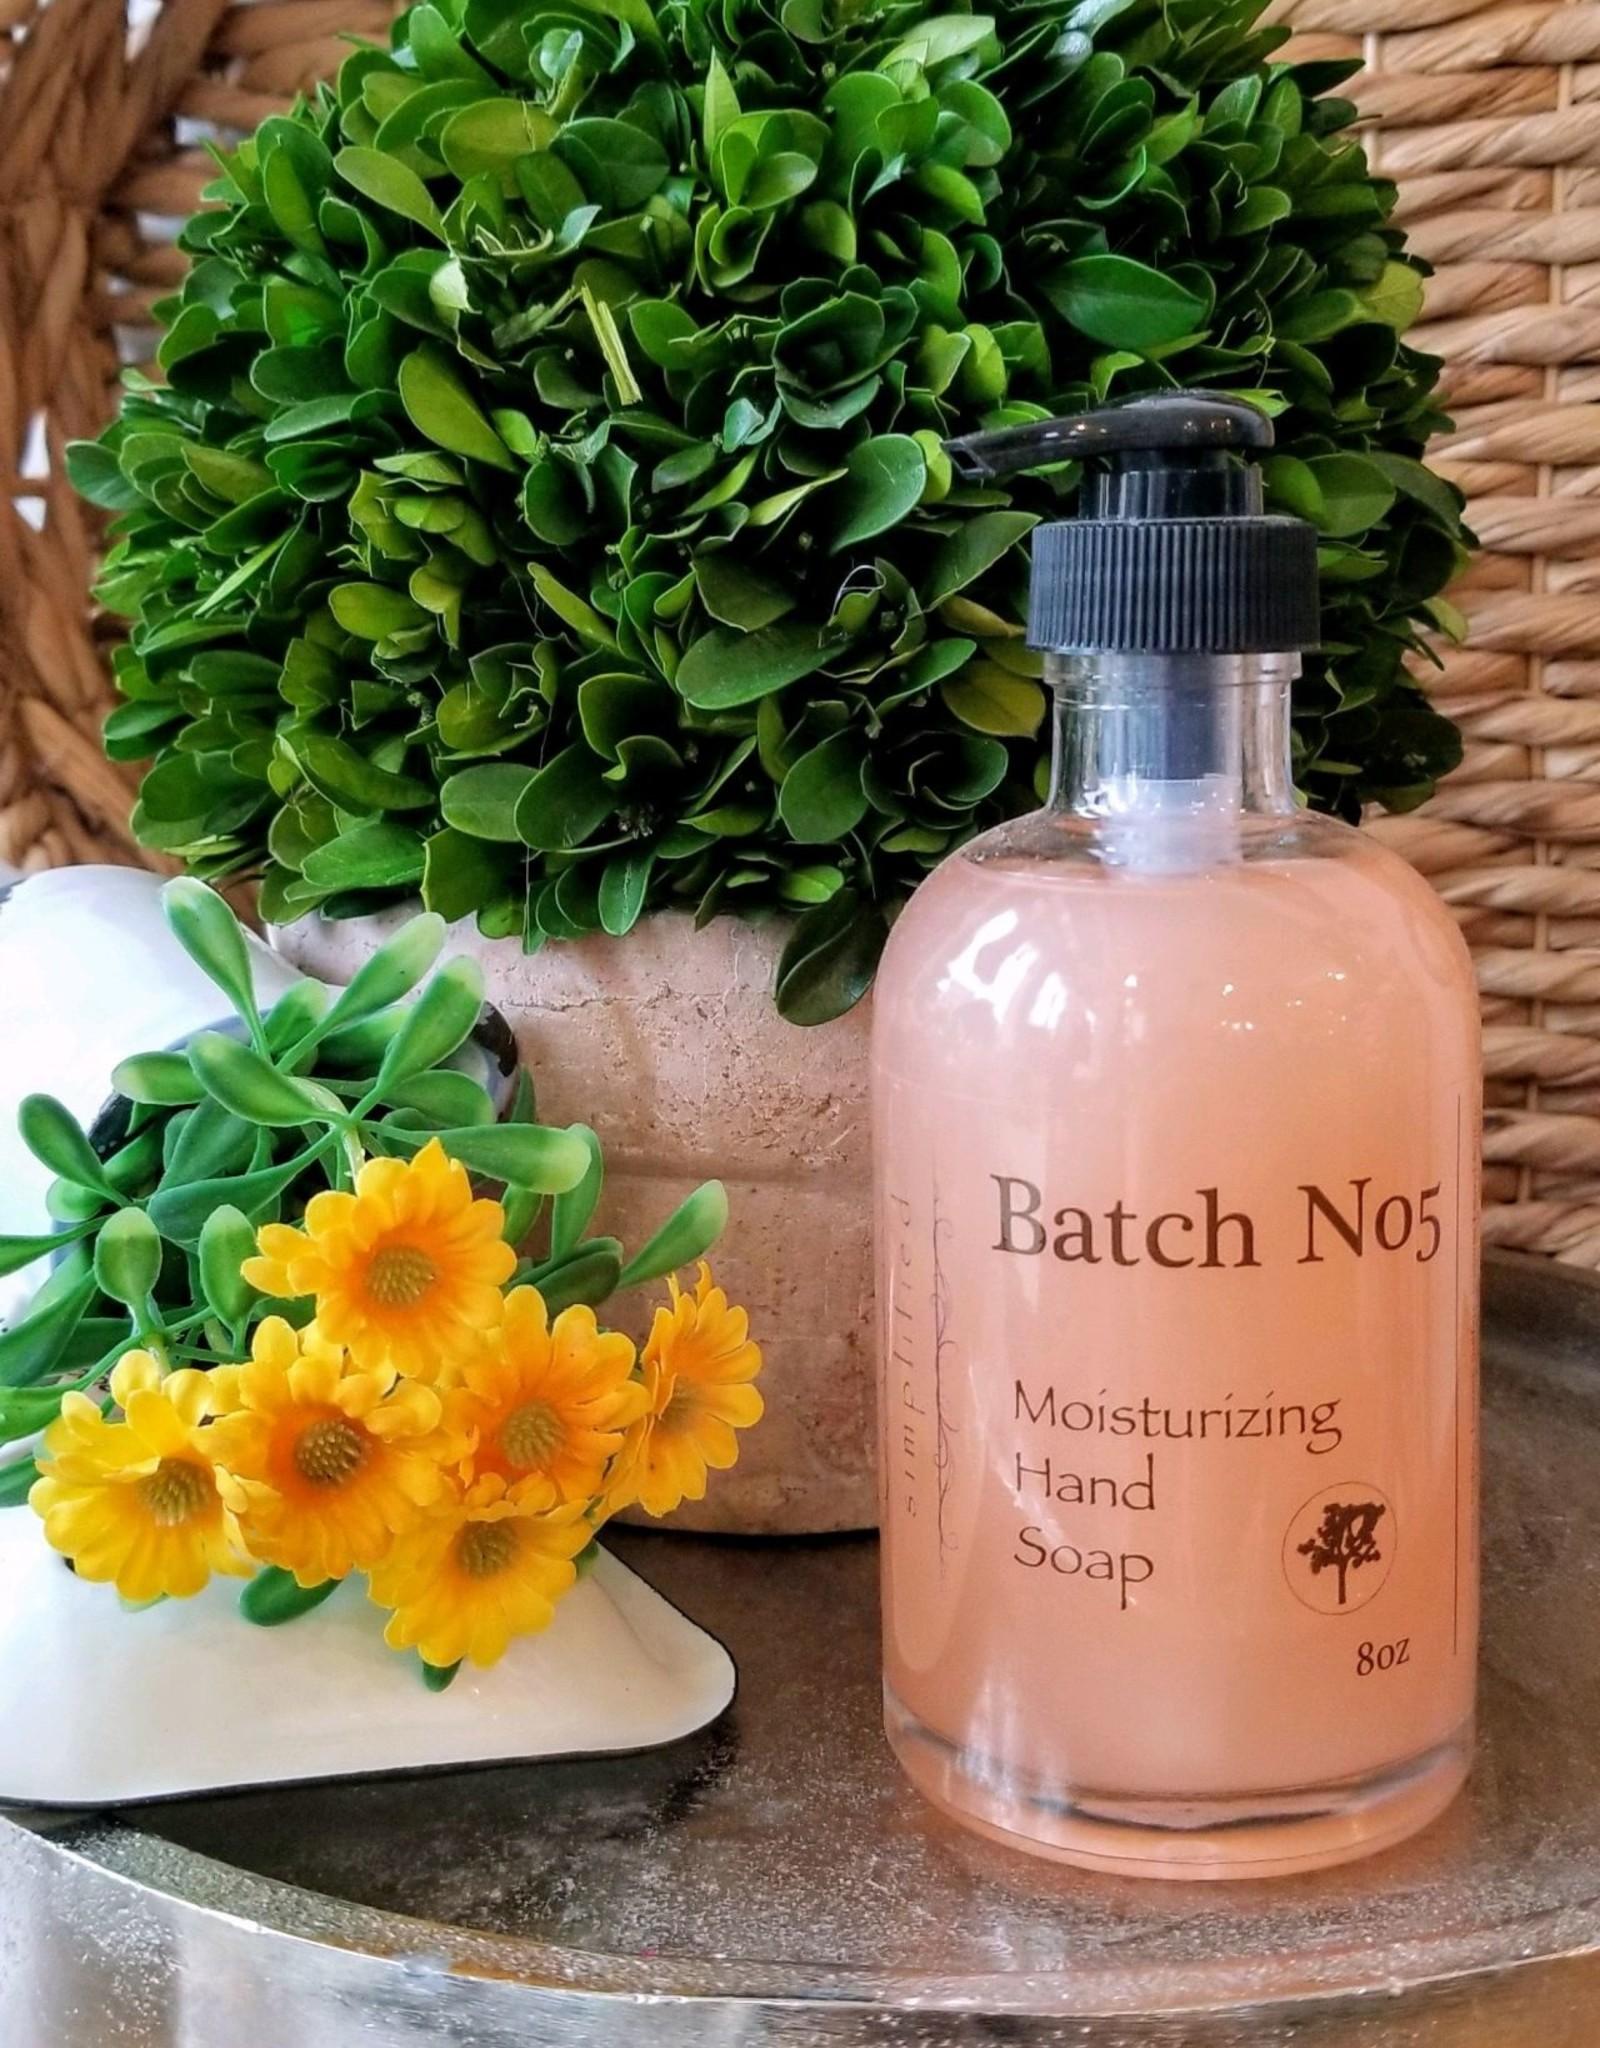 Simplified Soap Hand Soap 8oz - Batch No5